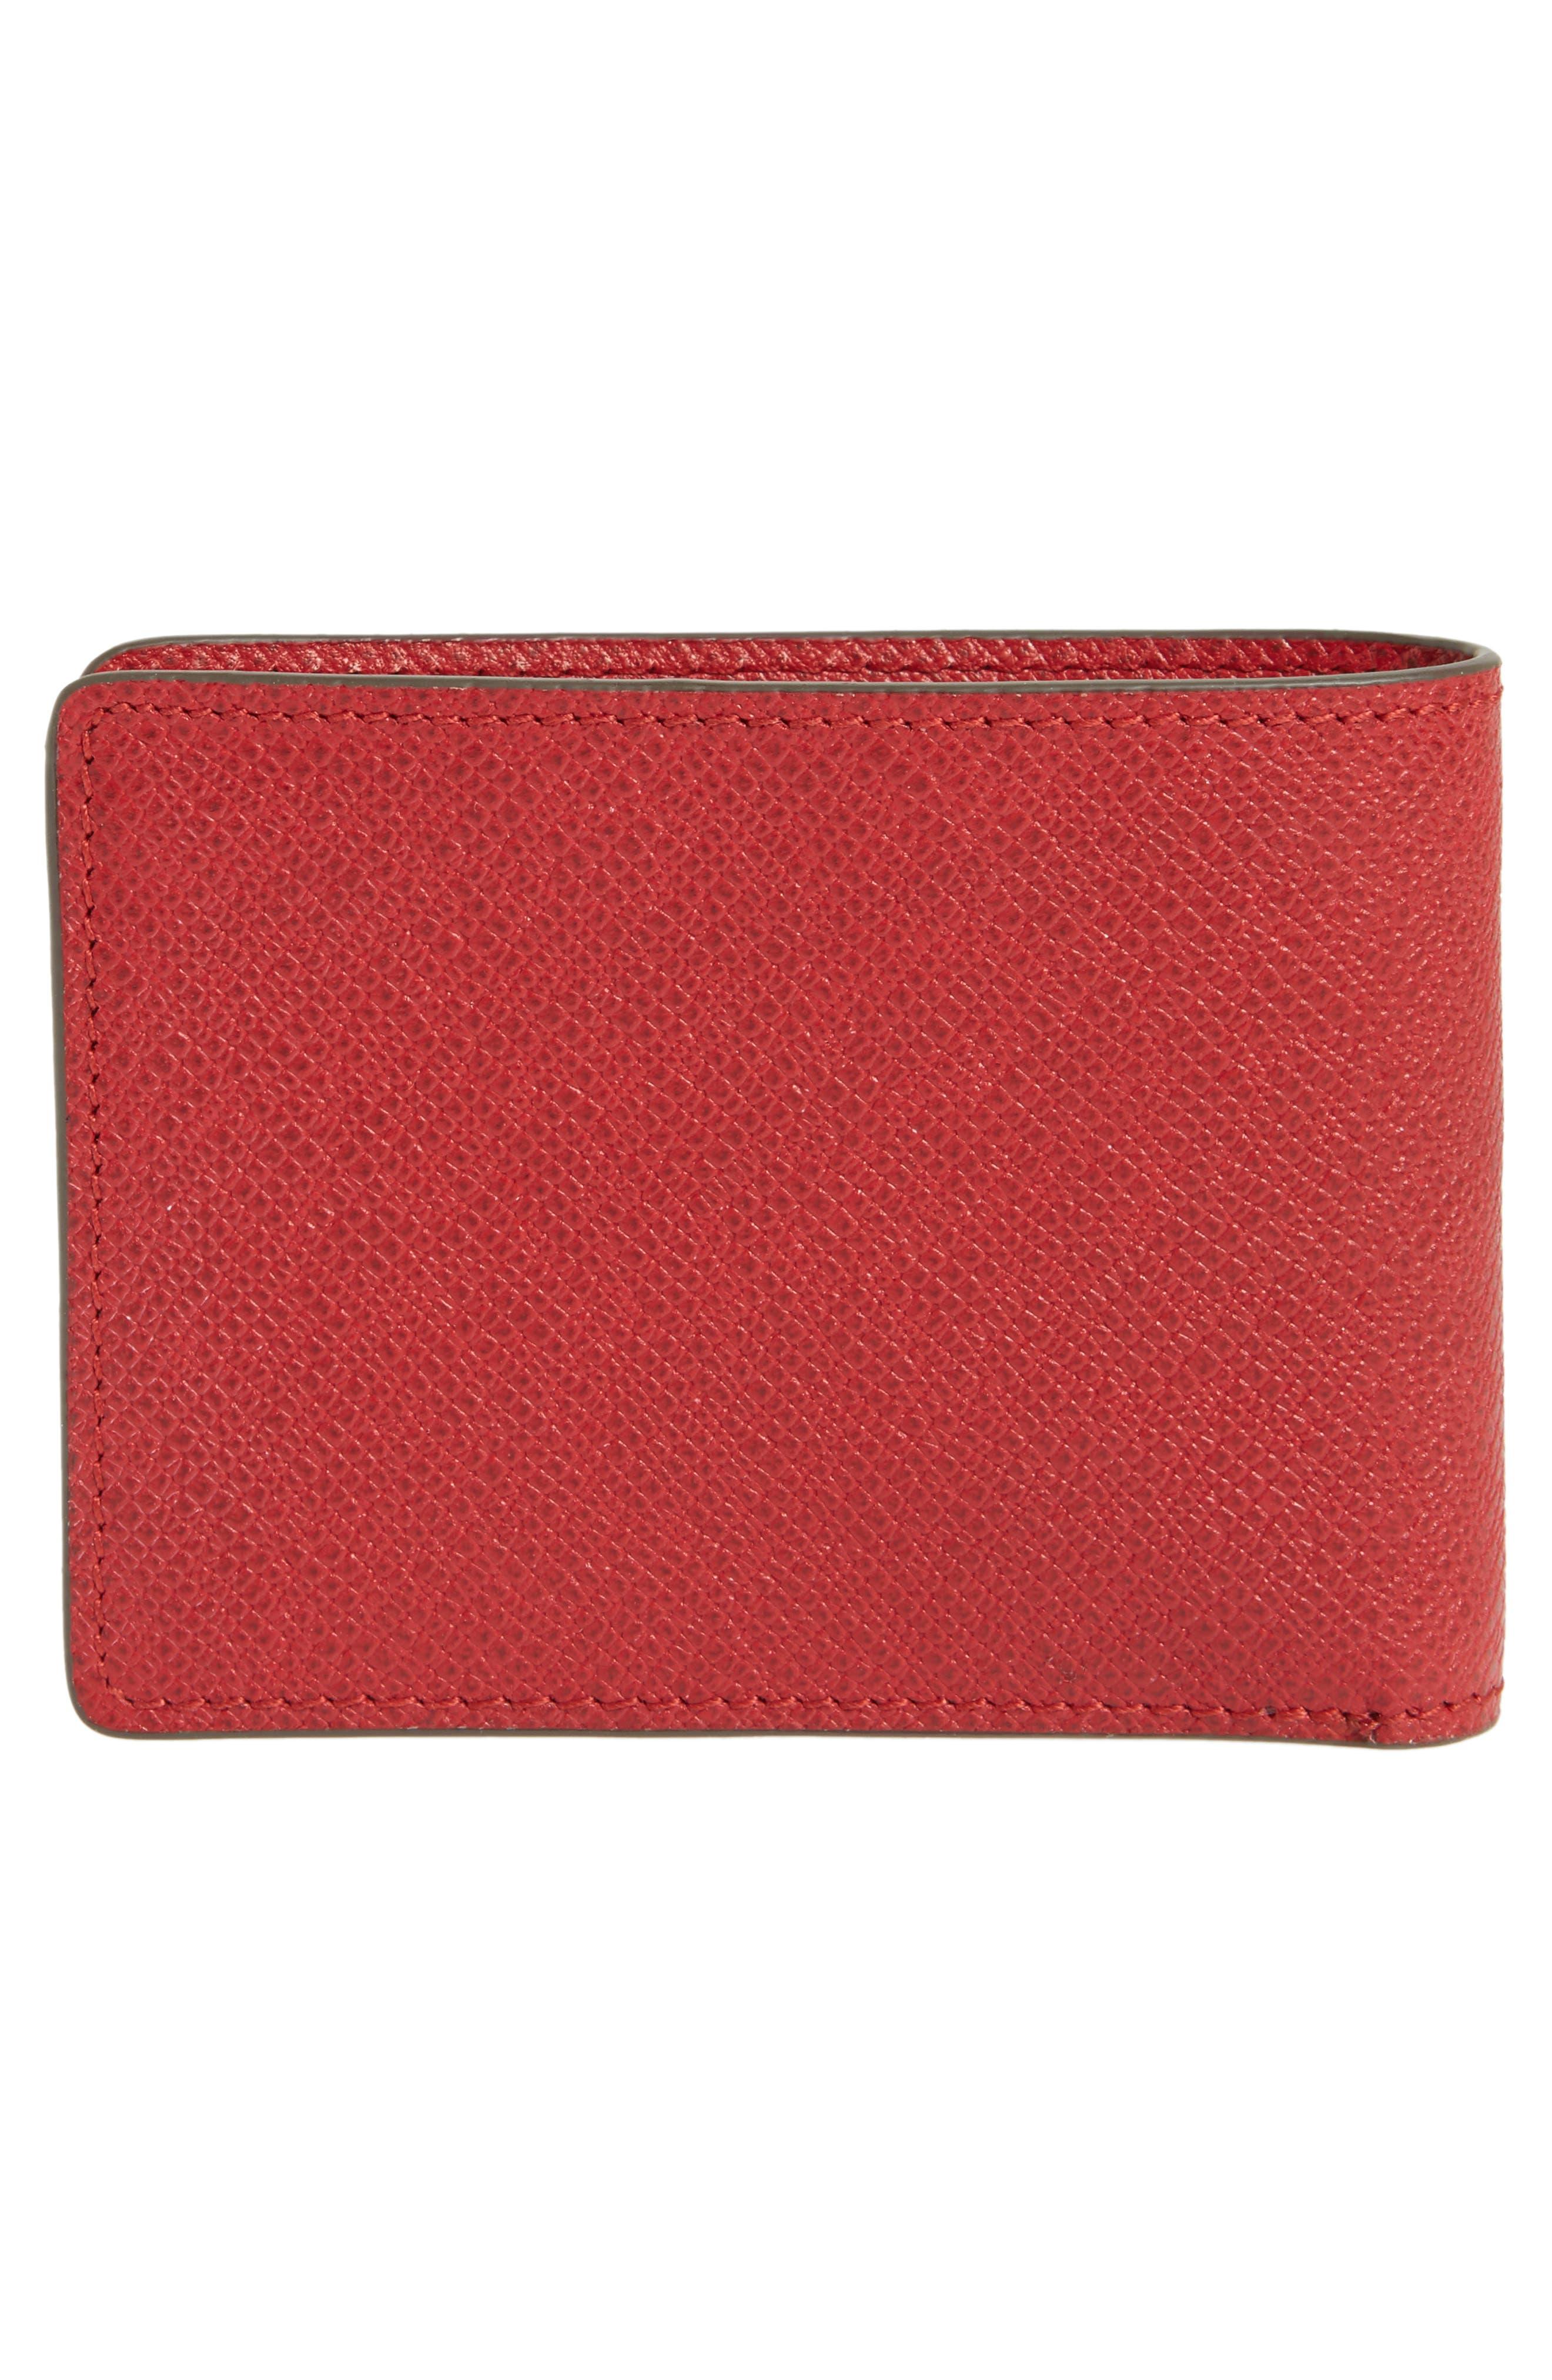 'Signature' Bifold Wallet,                             Alternate thumbnail 3, color,                             612